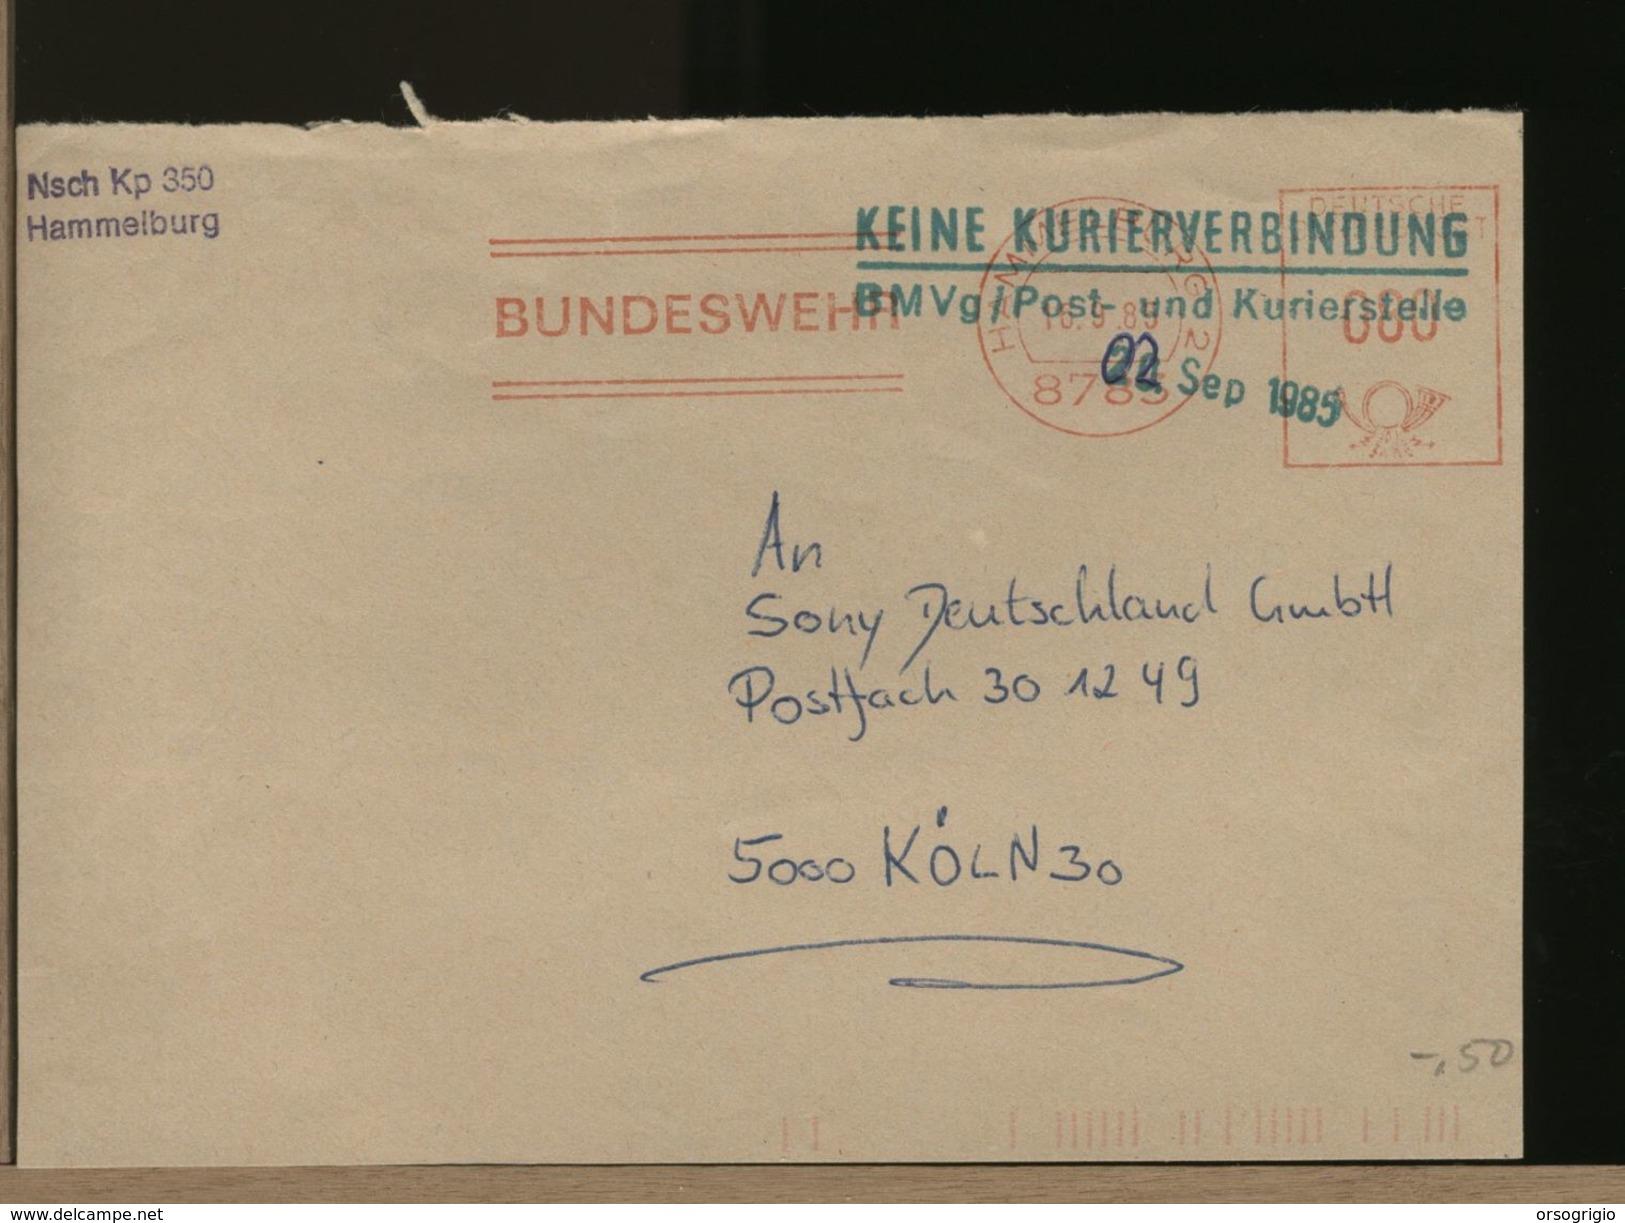 GERMANY - EMA - BUNDESWEHR  HAMMELBURG - BRD